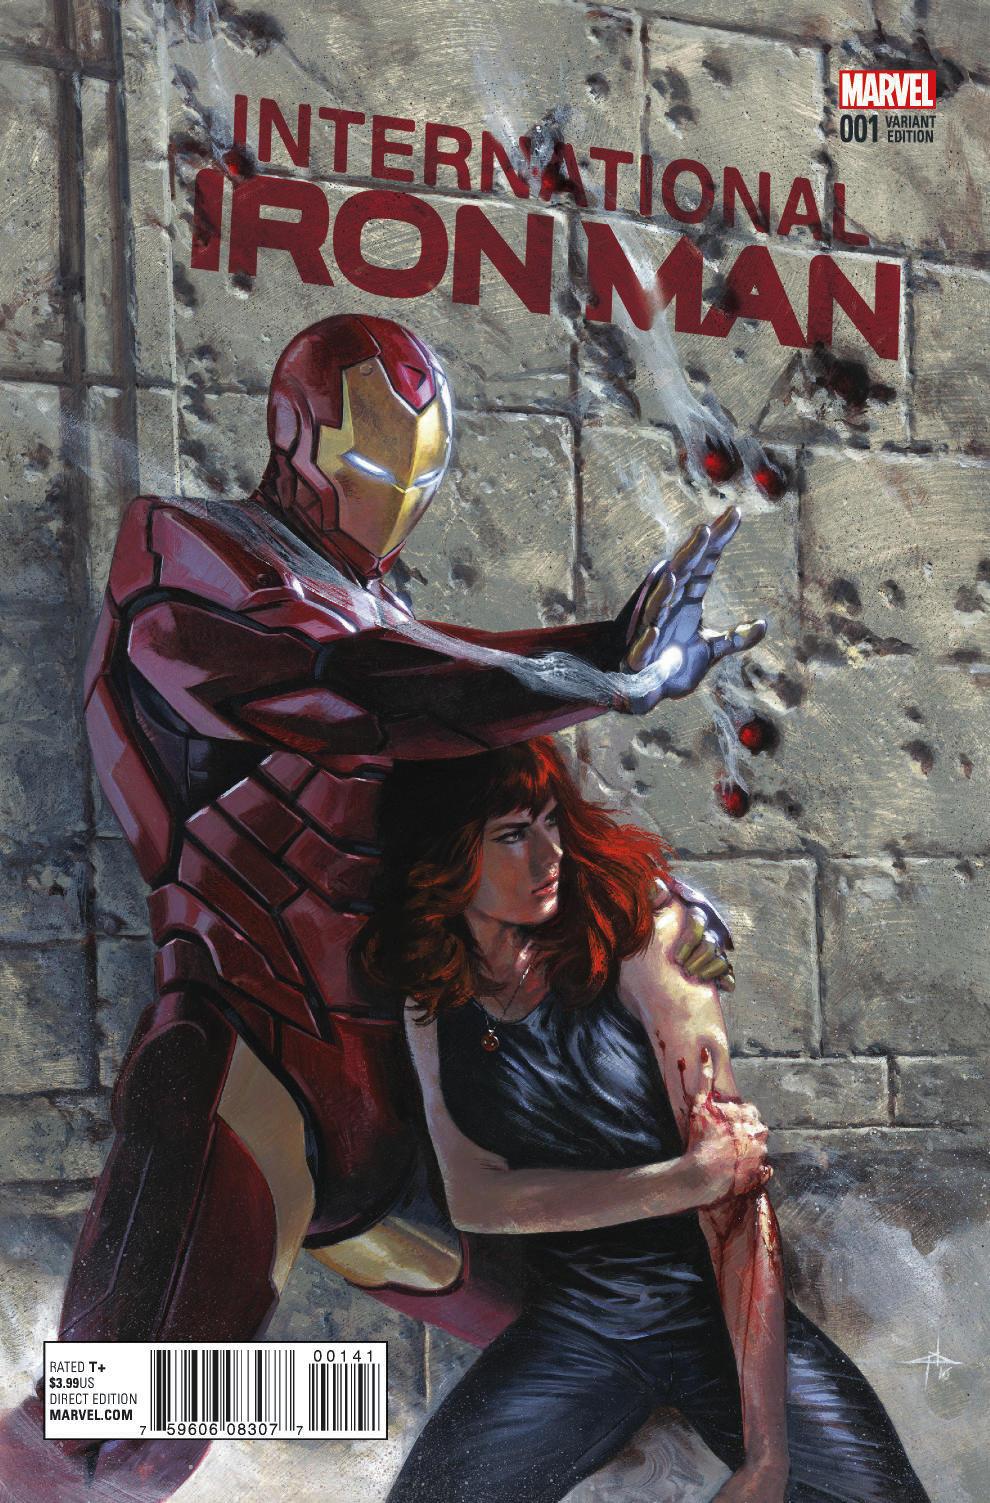 International Iron Man #1 Cover